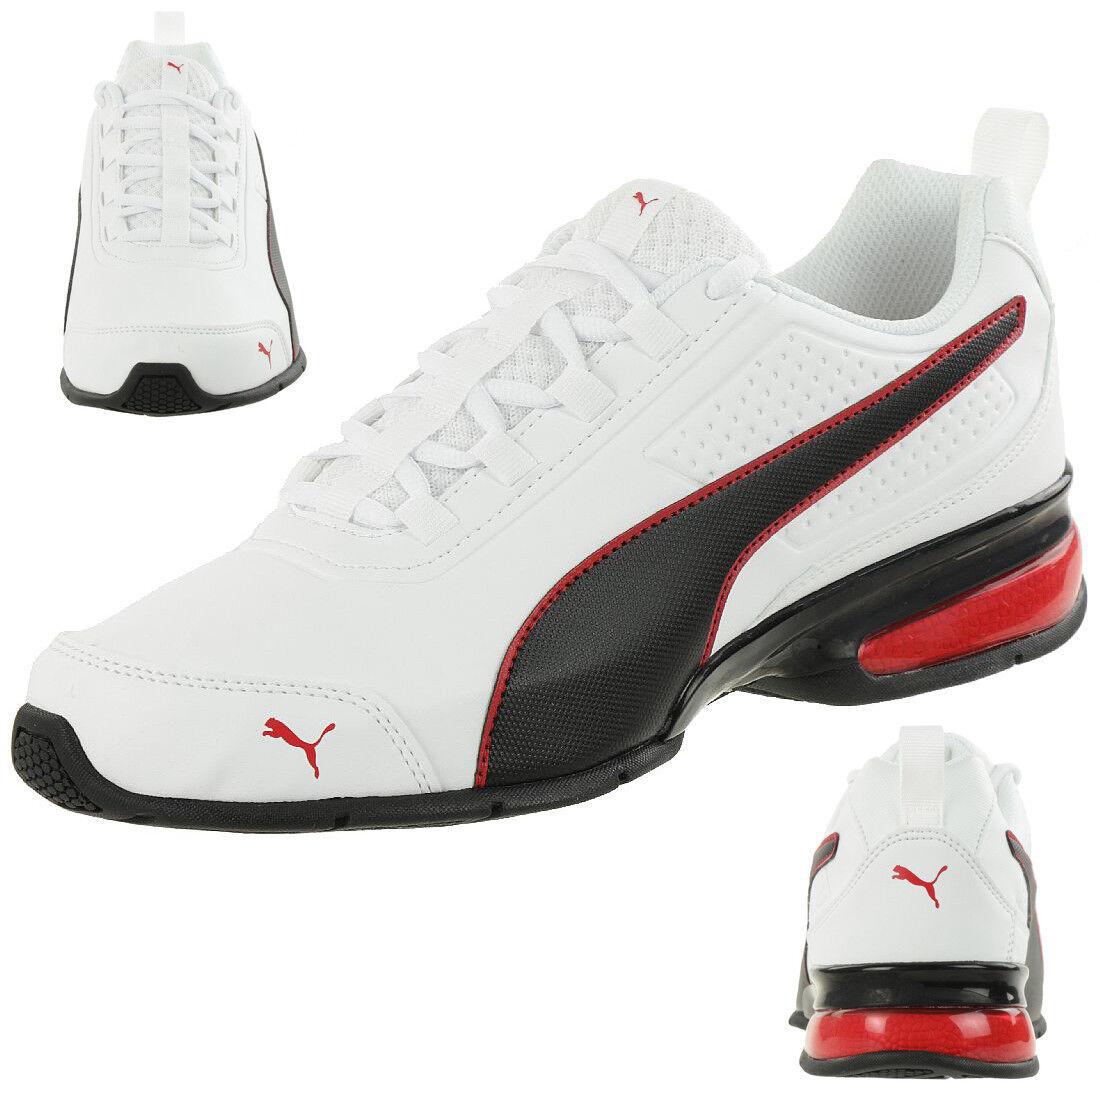 Puma Leader VT Sl Unisex Running shoes Trainers 365291 01